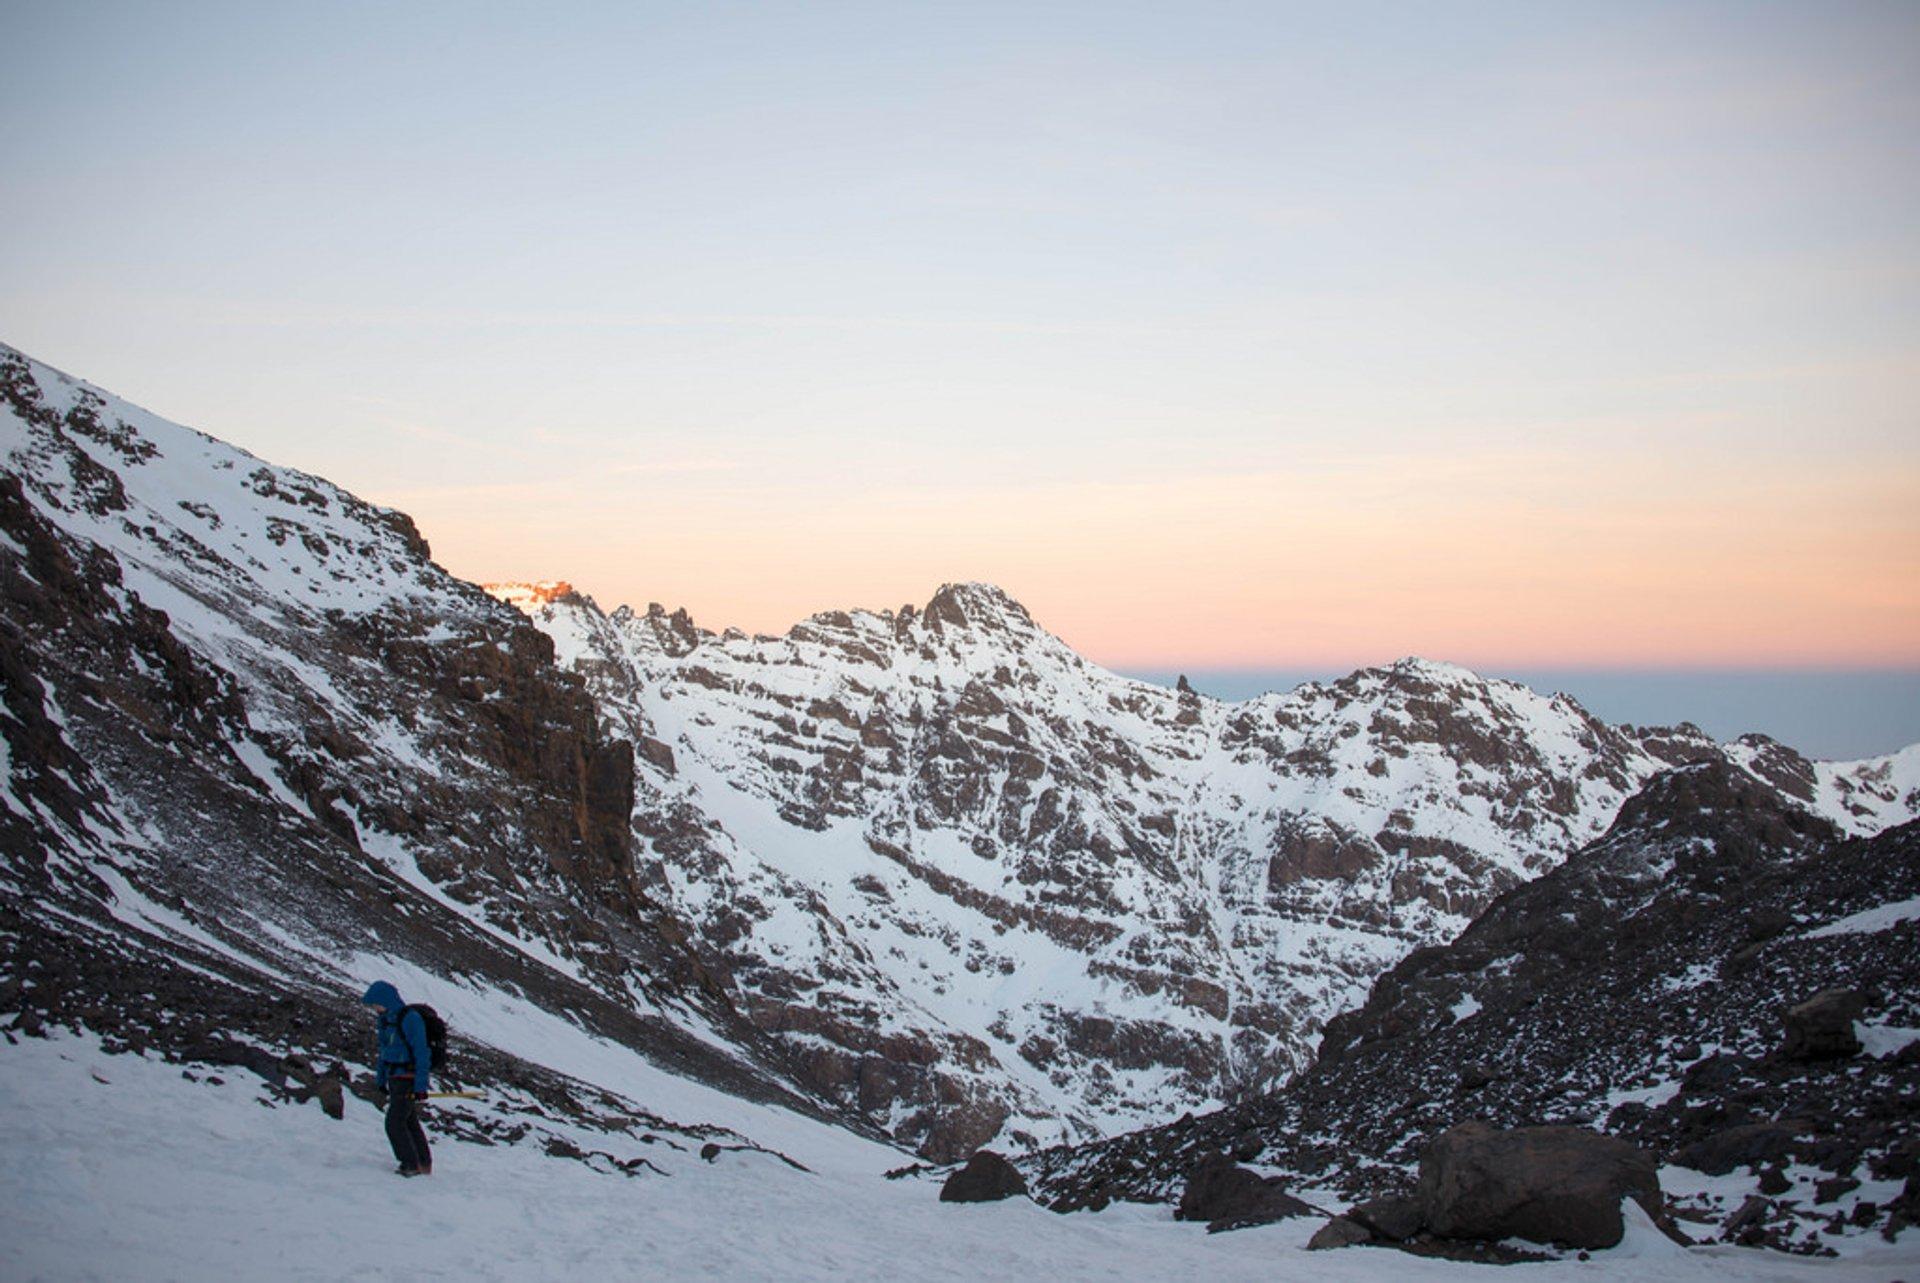 Climbing Mount Toubkal in Morocco - Best Season 2020